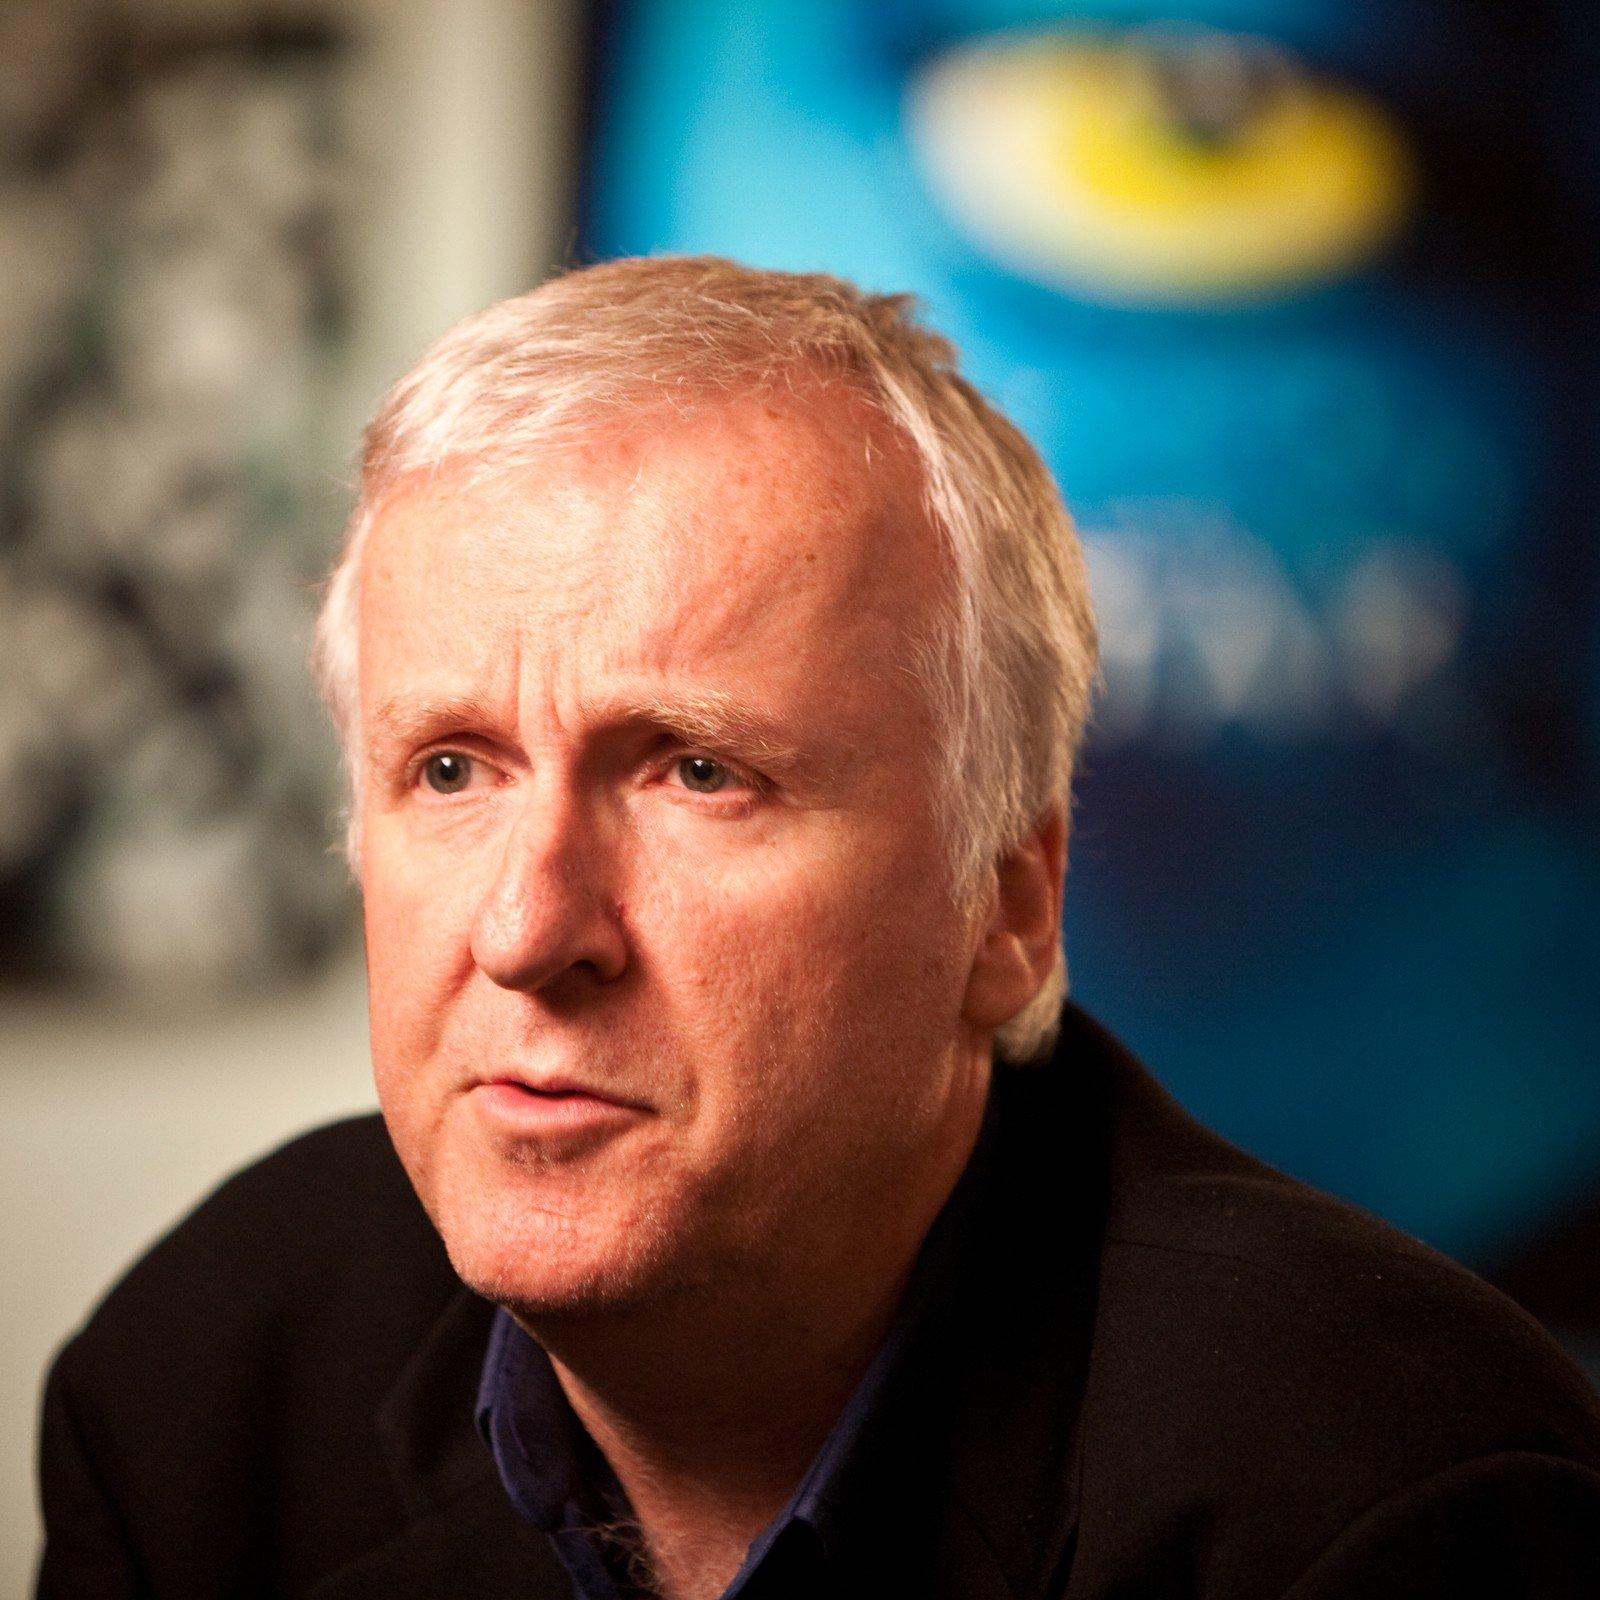 James Cameron: James Cameron Net Worth